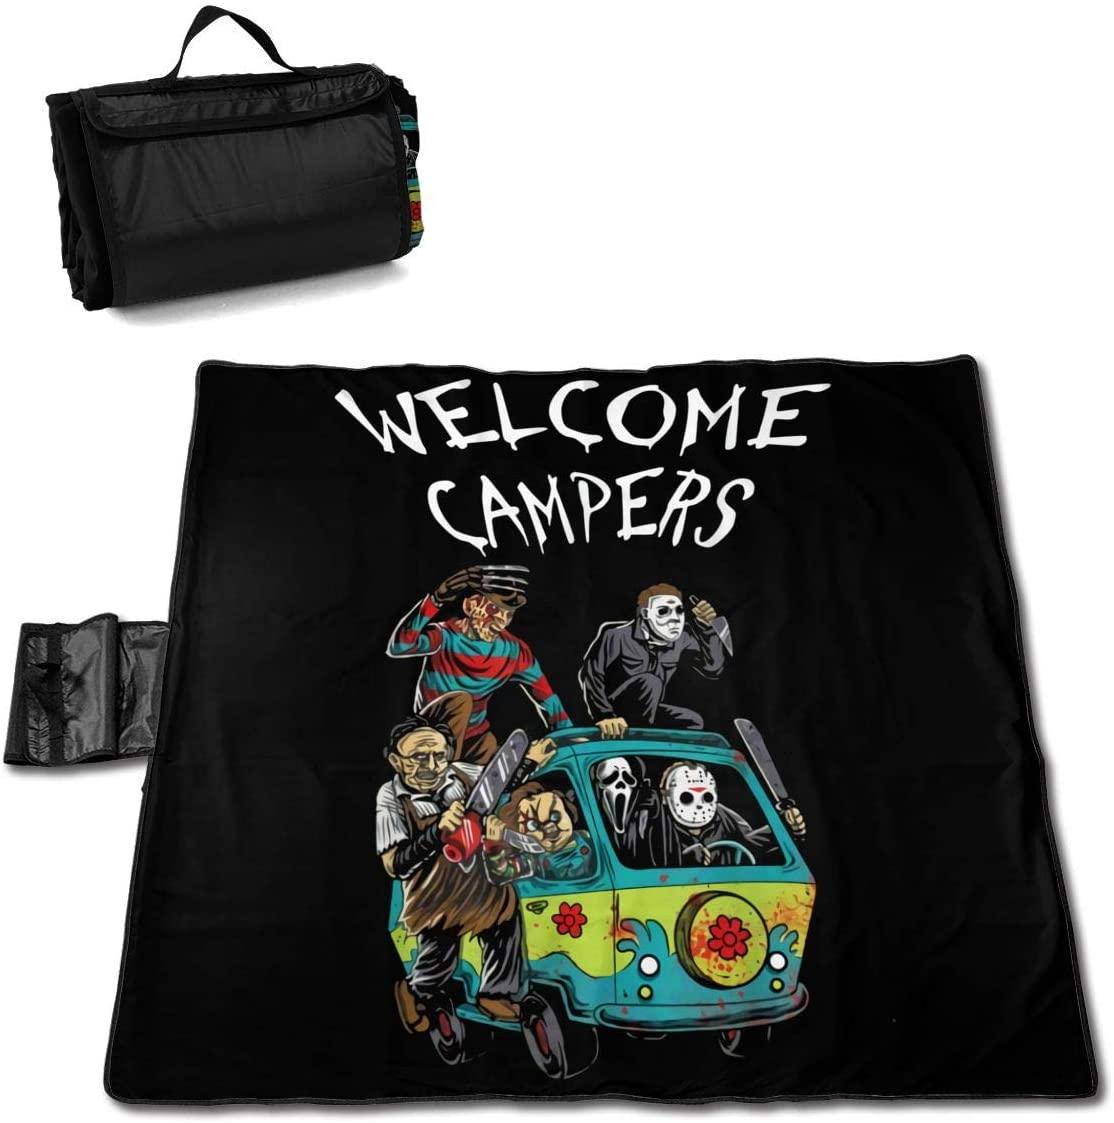 Welcome Campers Portable Printed Picnic Blanket Waterproof 59x57(in)